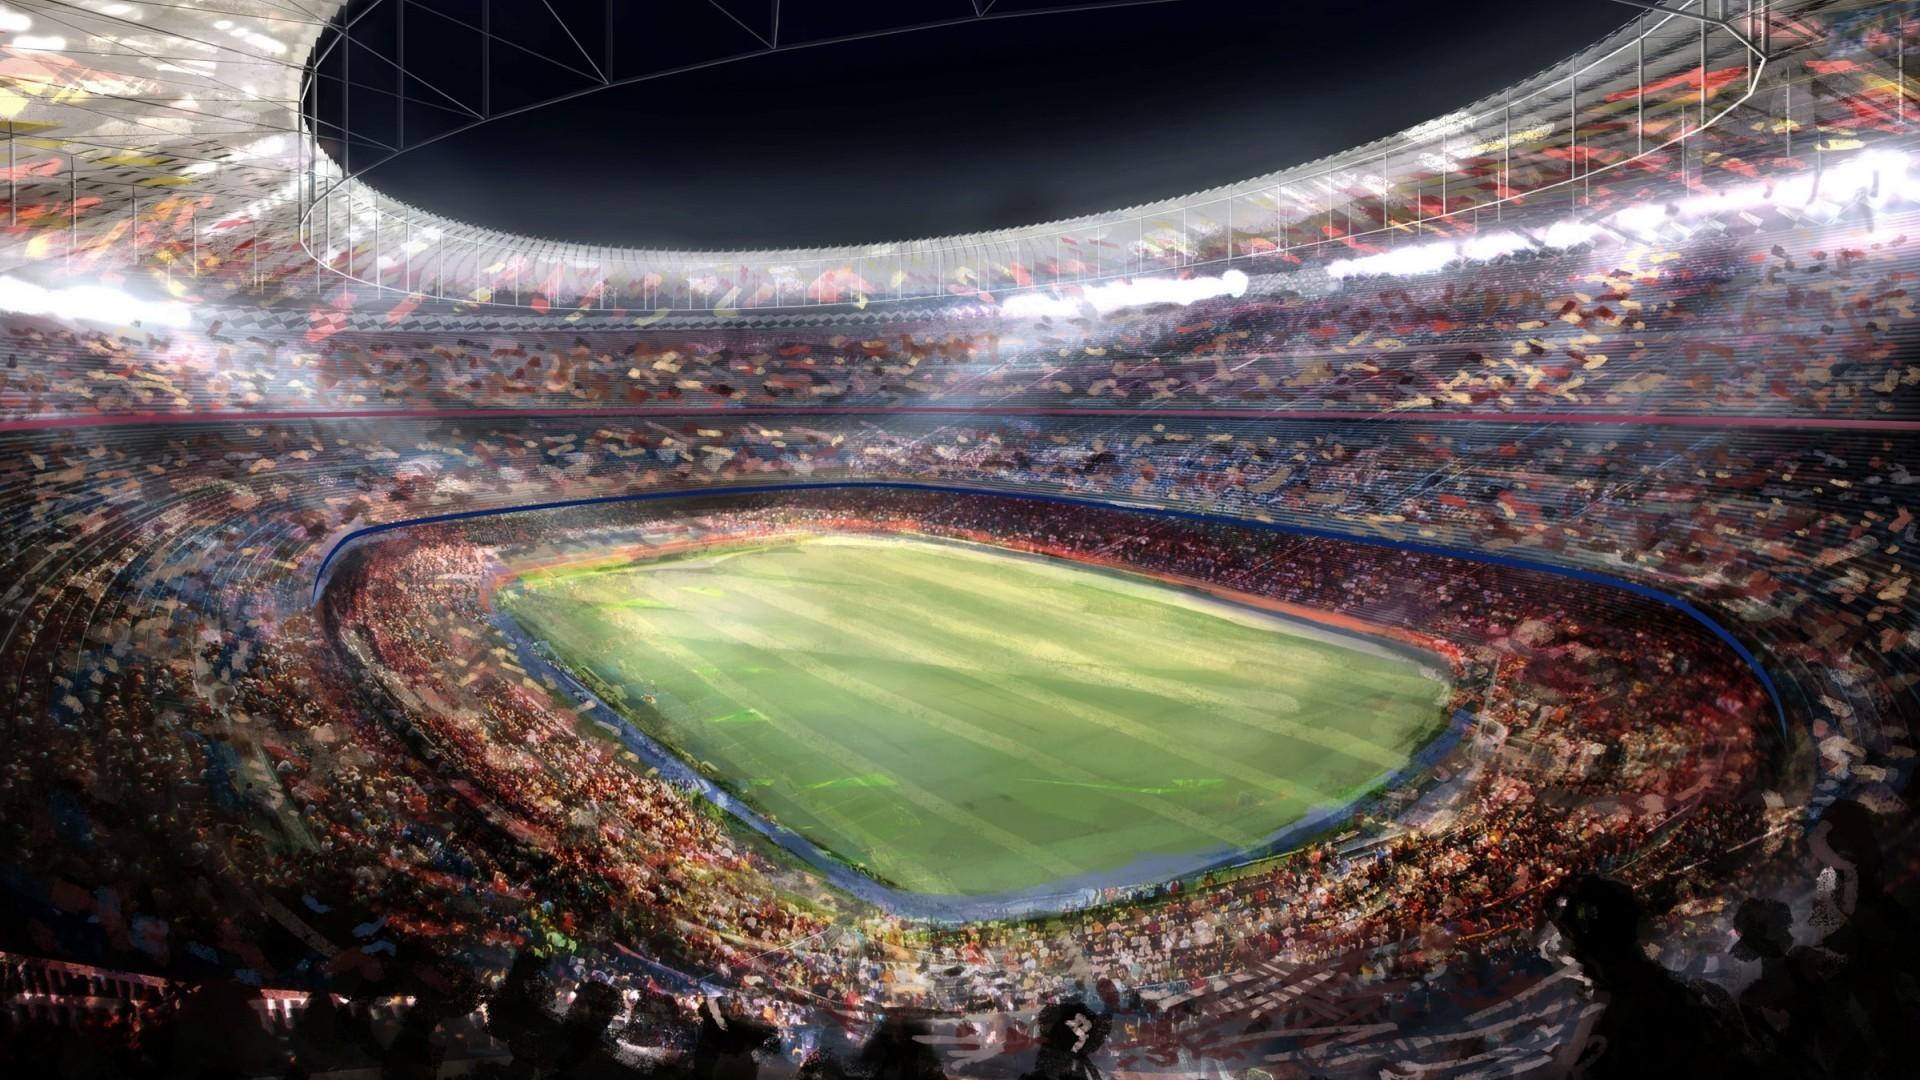 Football Stadium Hd Wallpapers | Hd Wallpapers